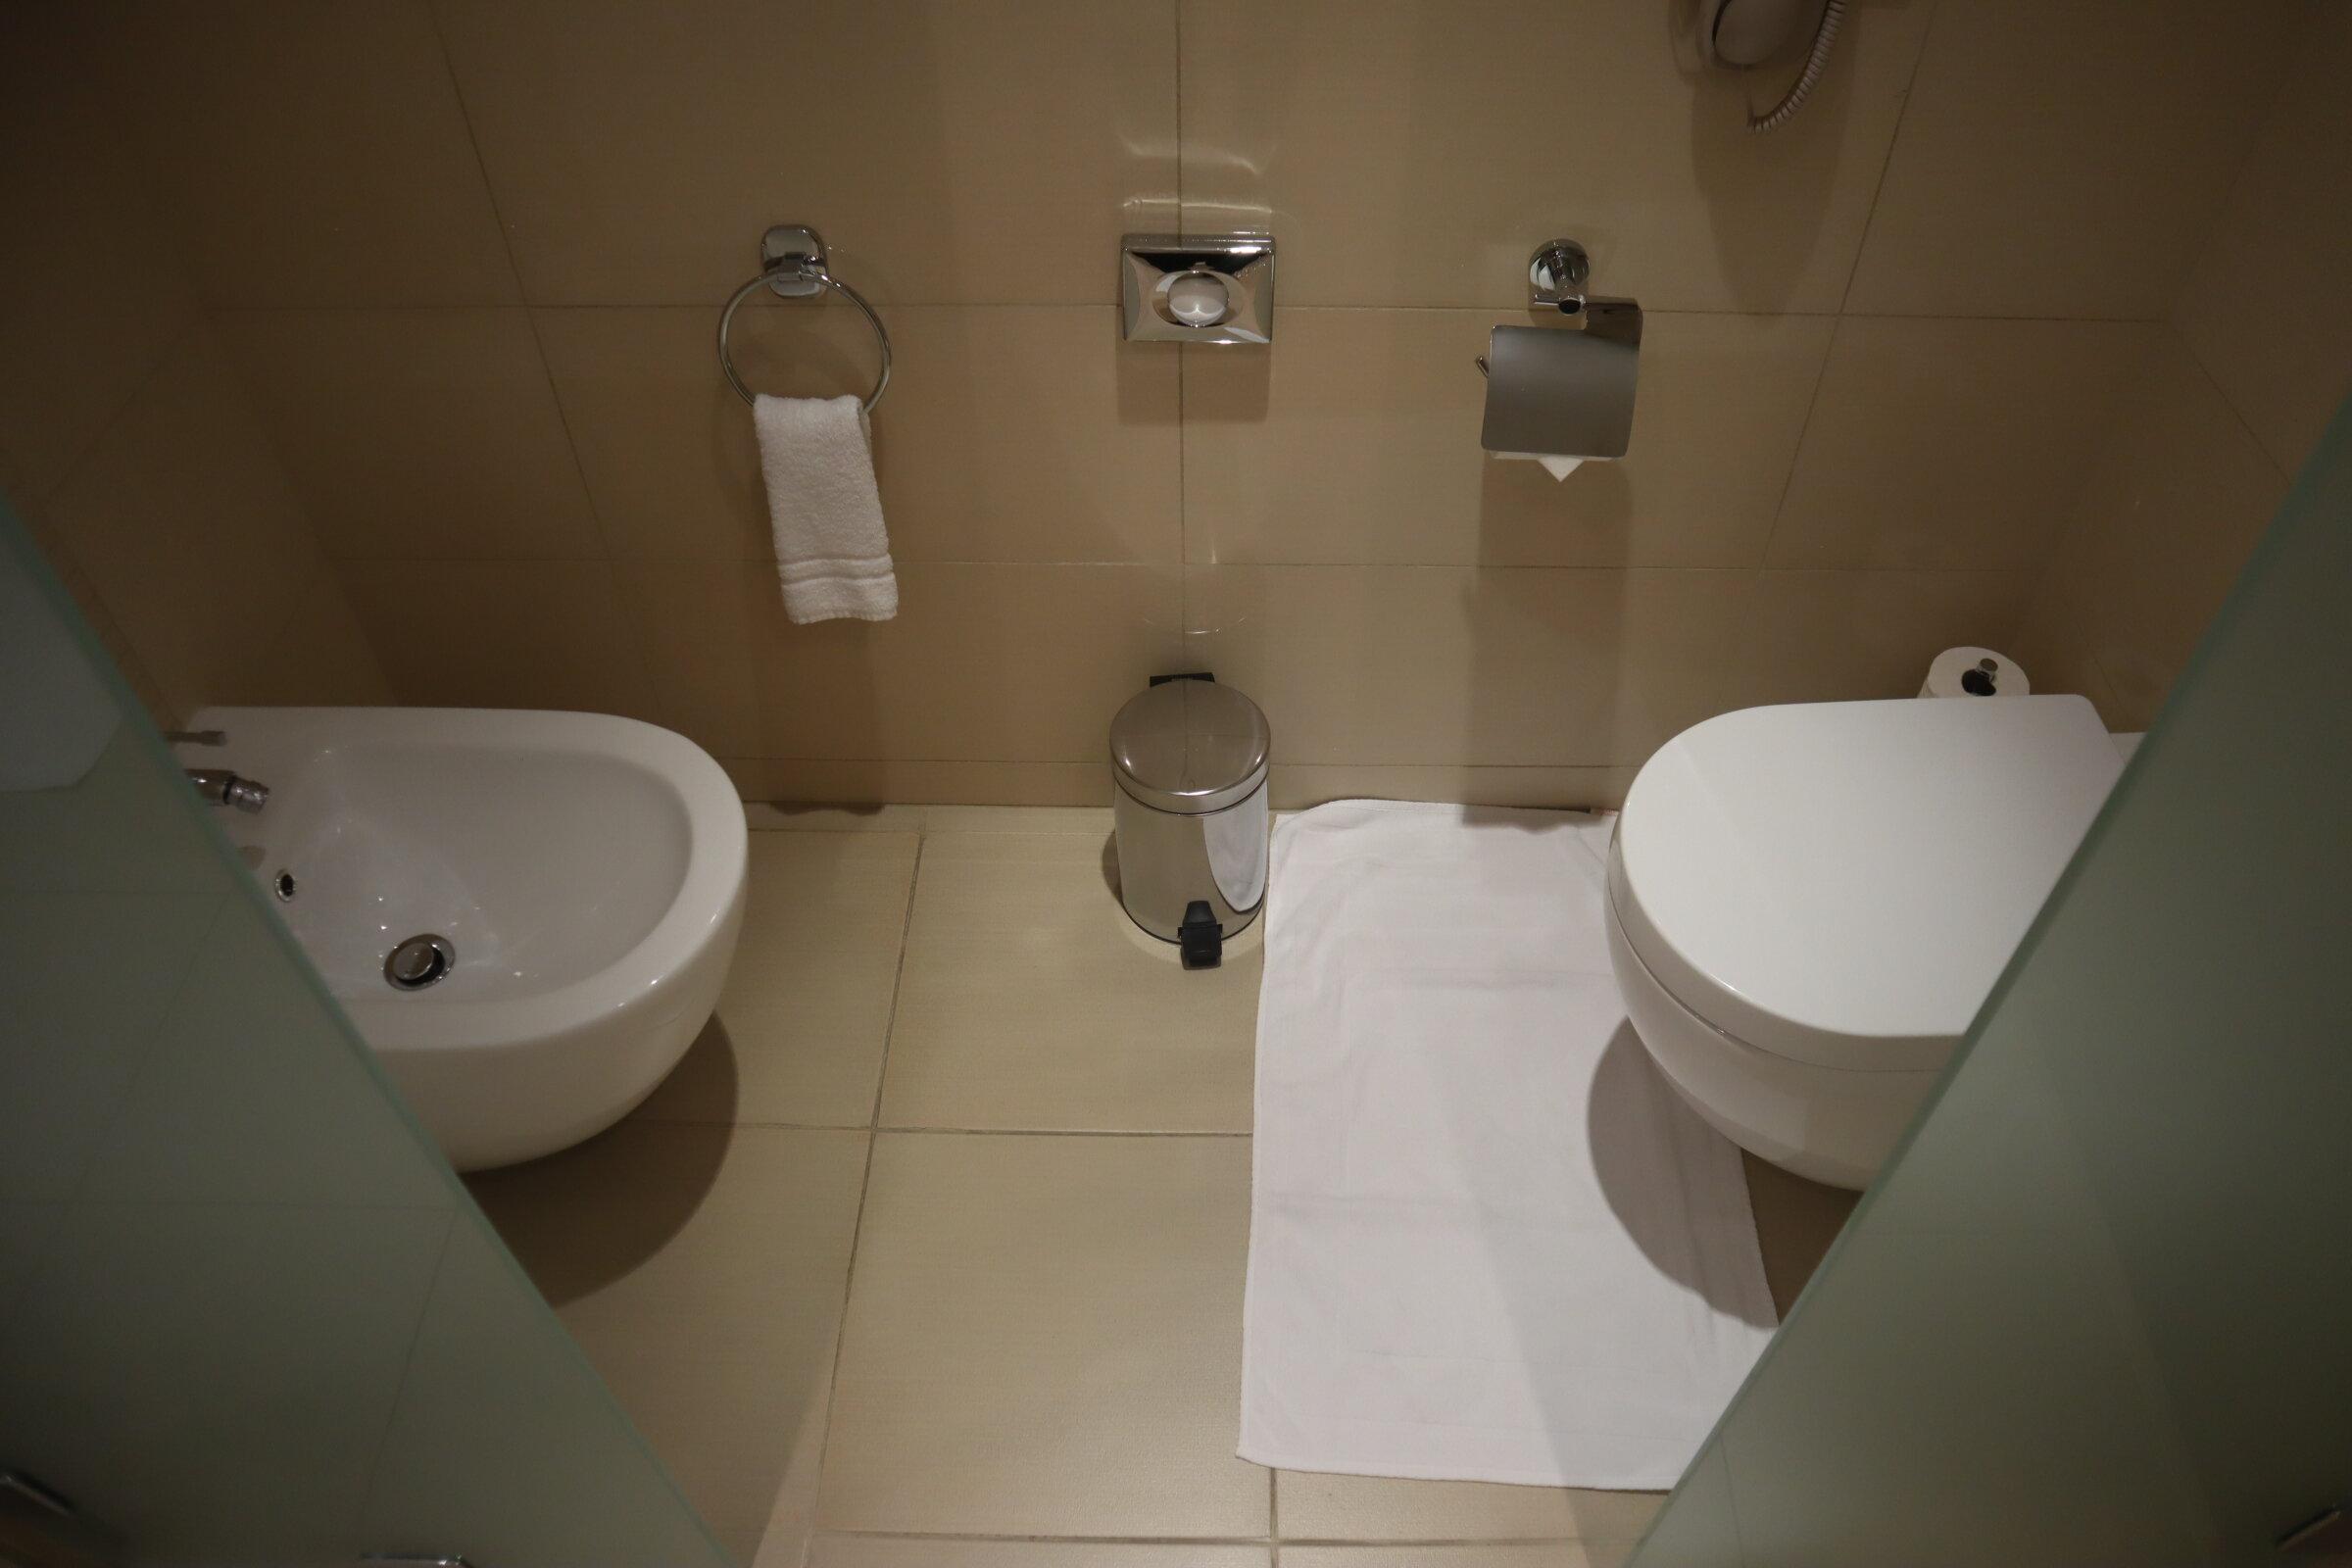 Sheraton Oman – Studio Suite toilet and bidet